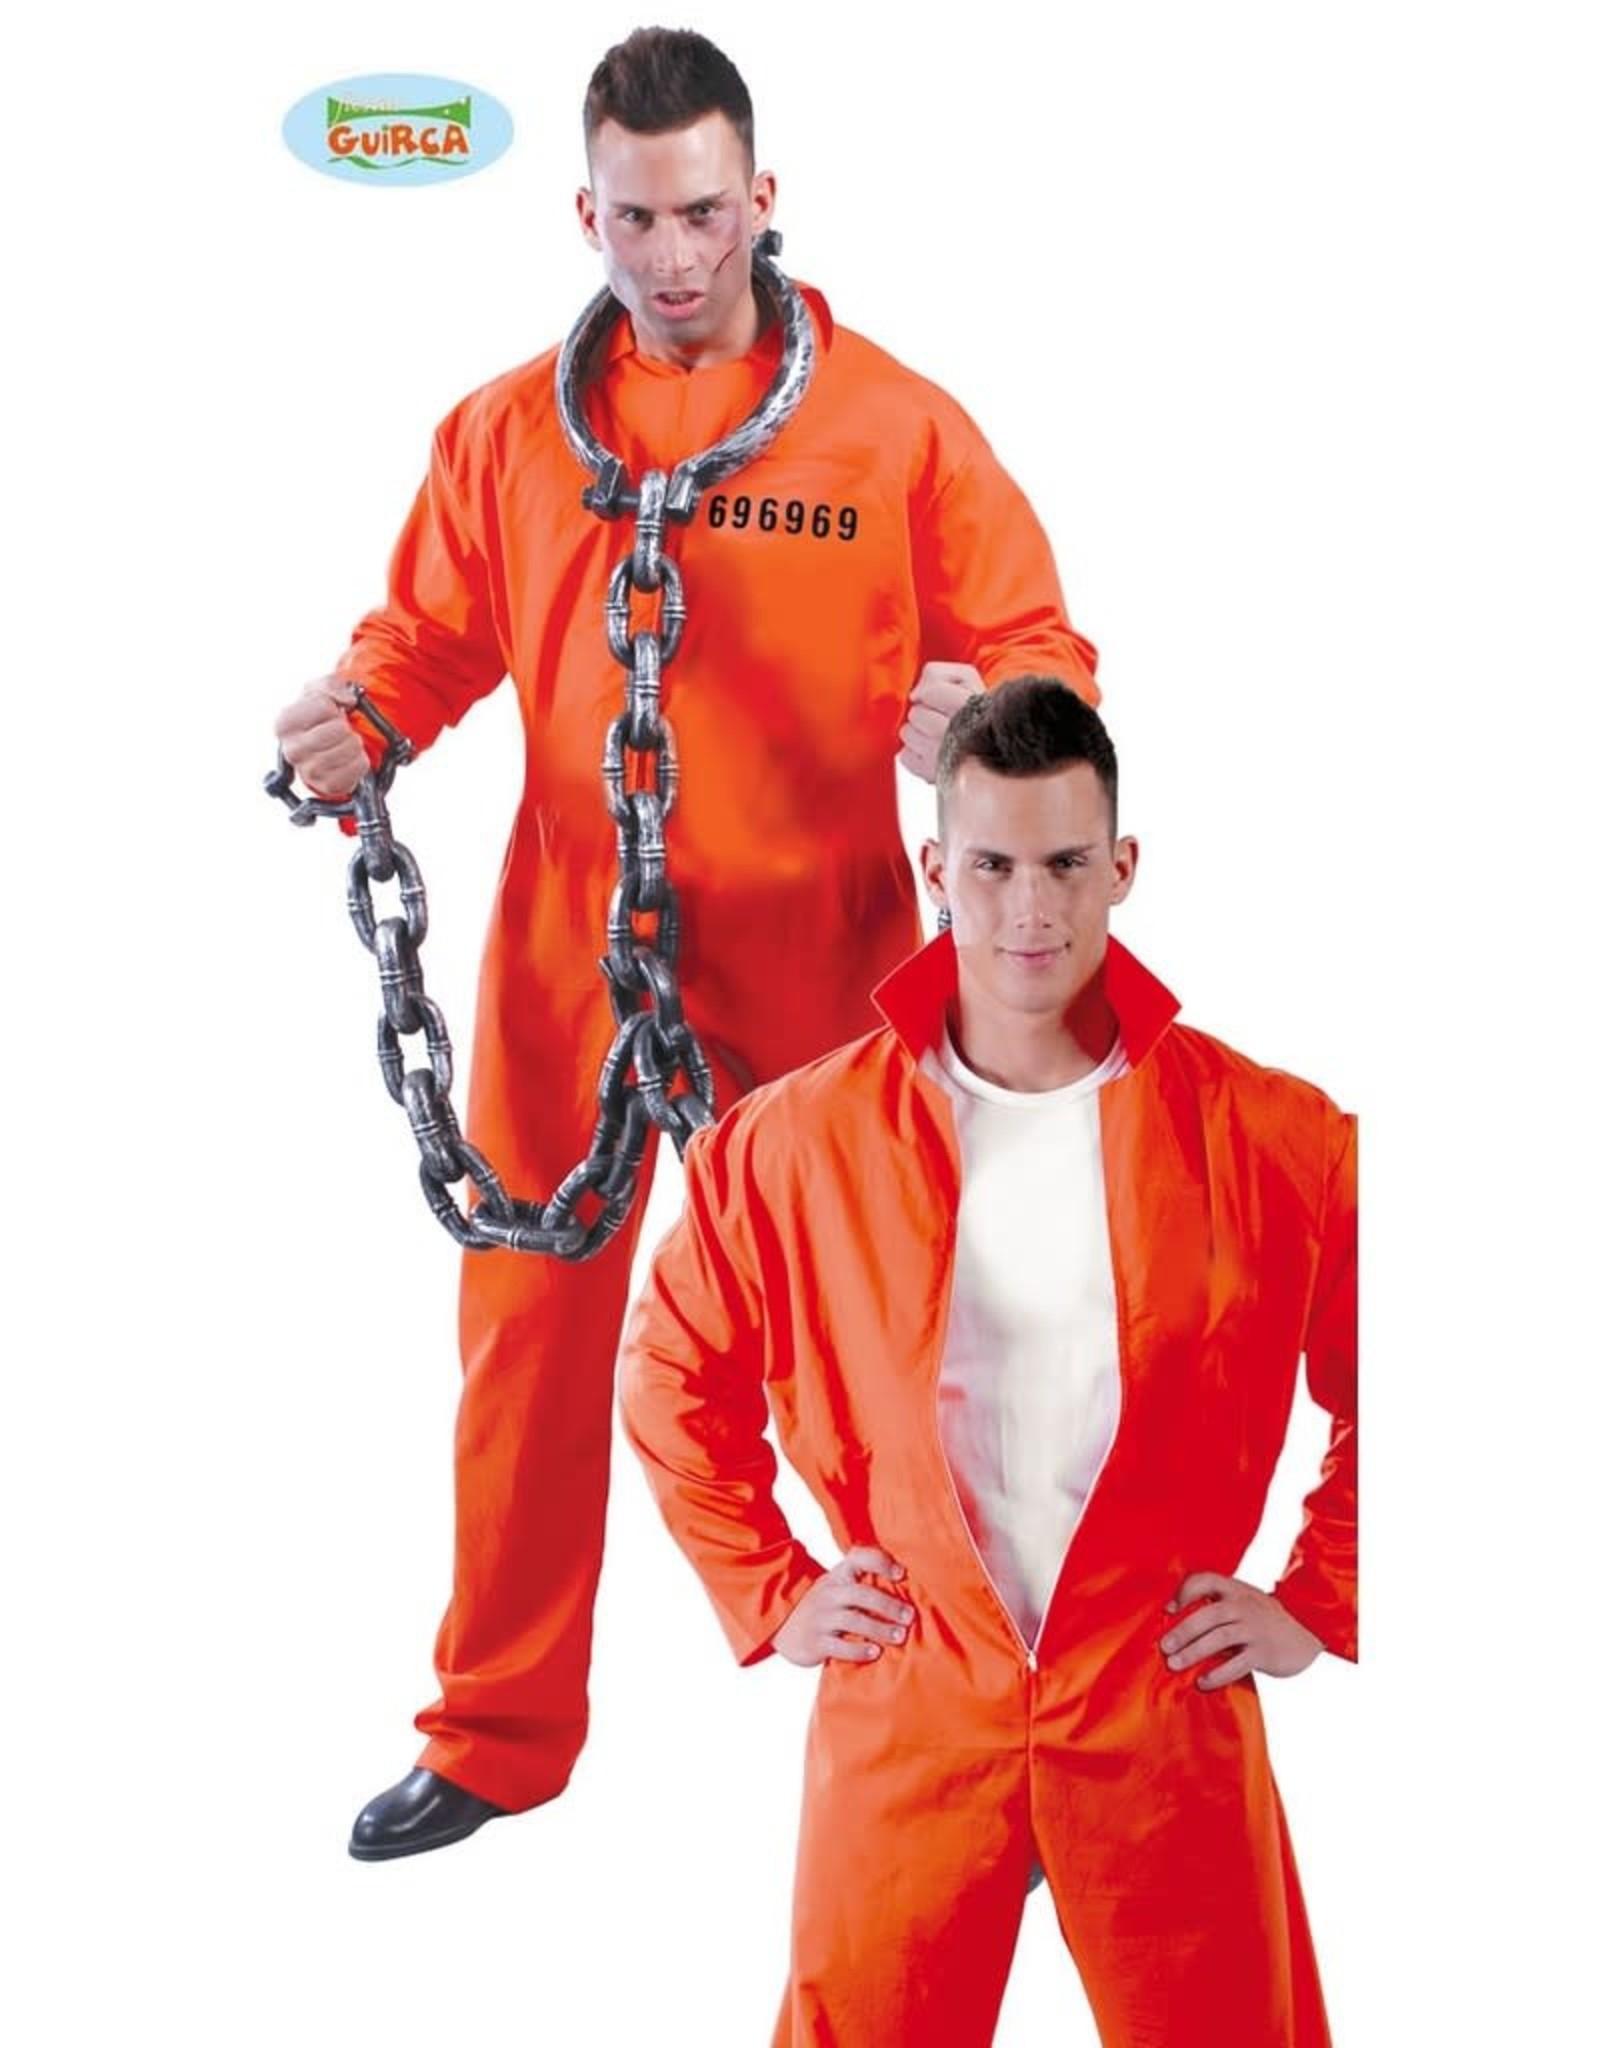 FIESTAS GUIRCA Gevangene oranje